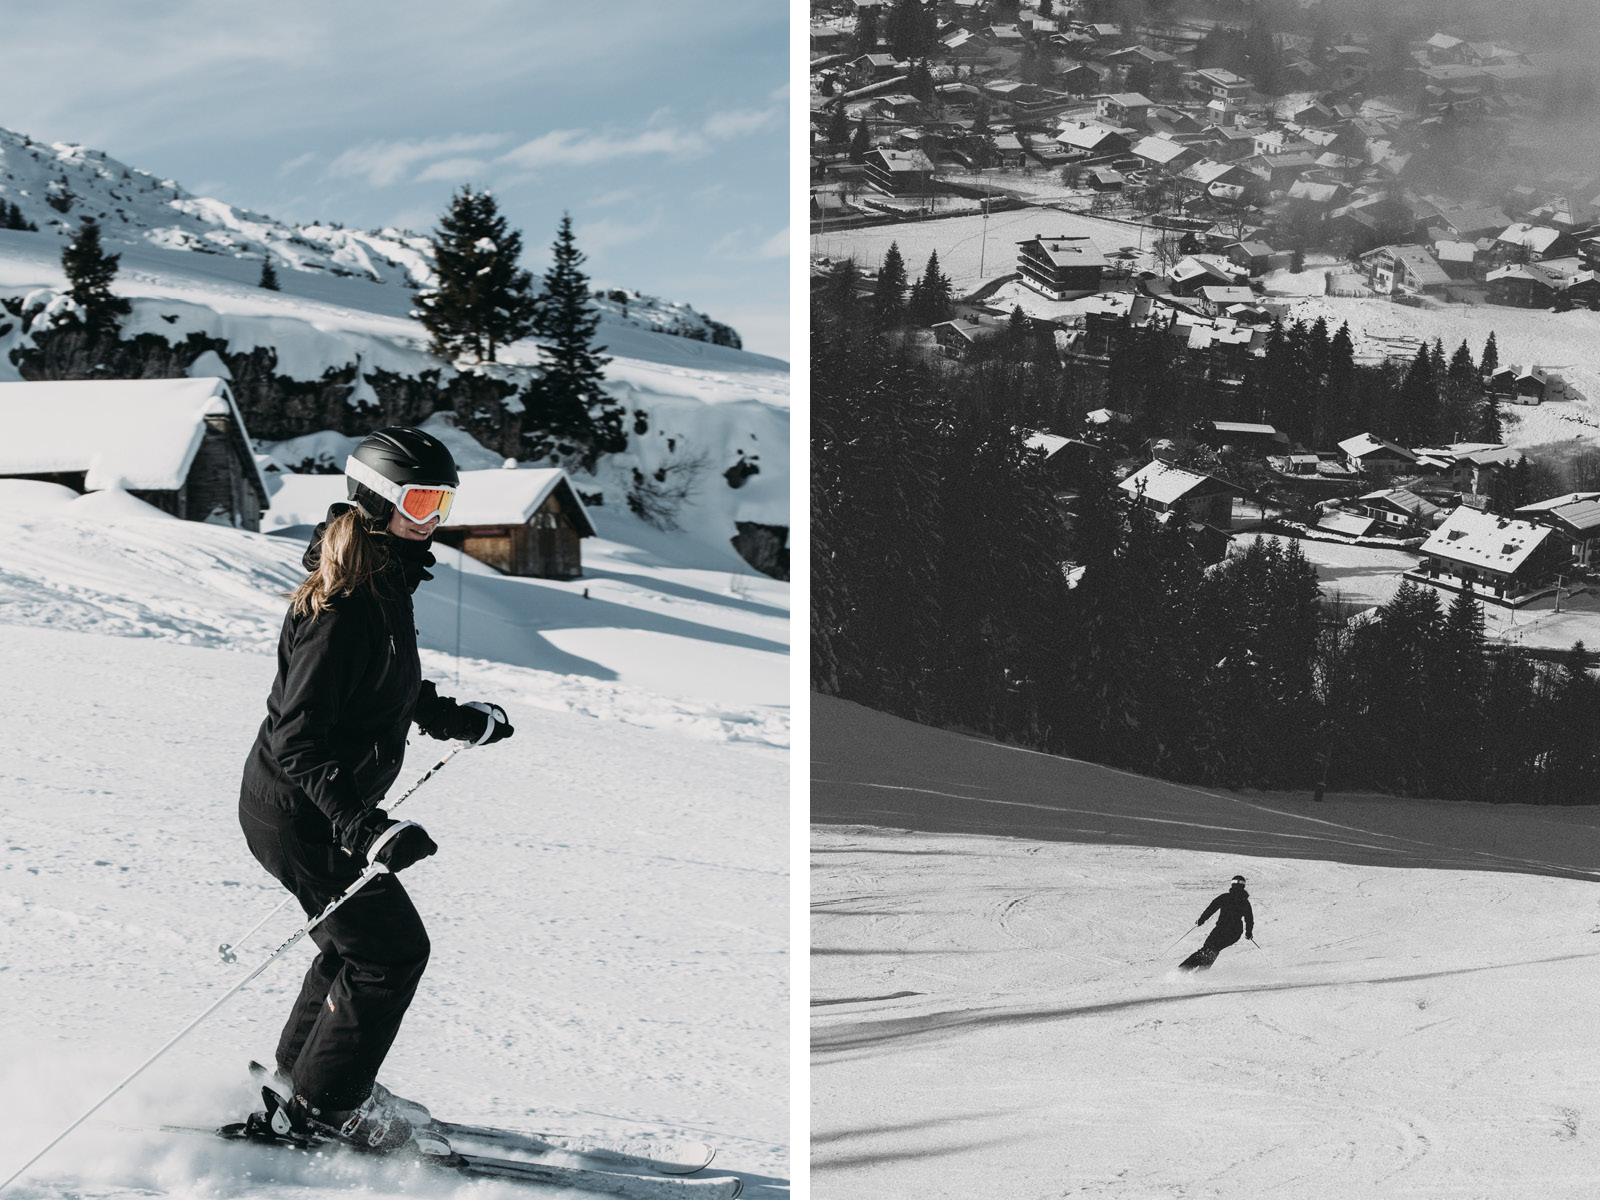 Evabloem_travel_wintersports_le-grande-massif-0019a.jpg